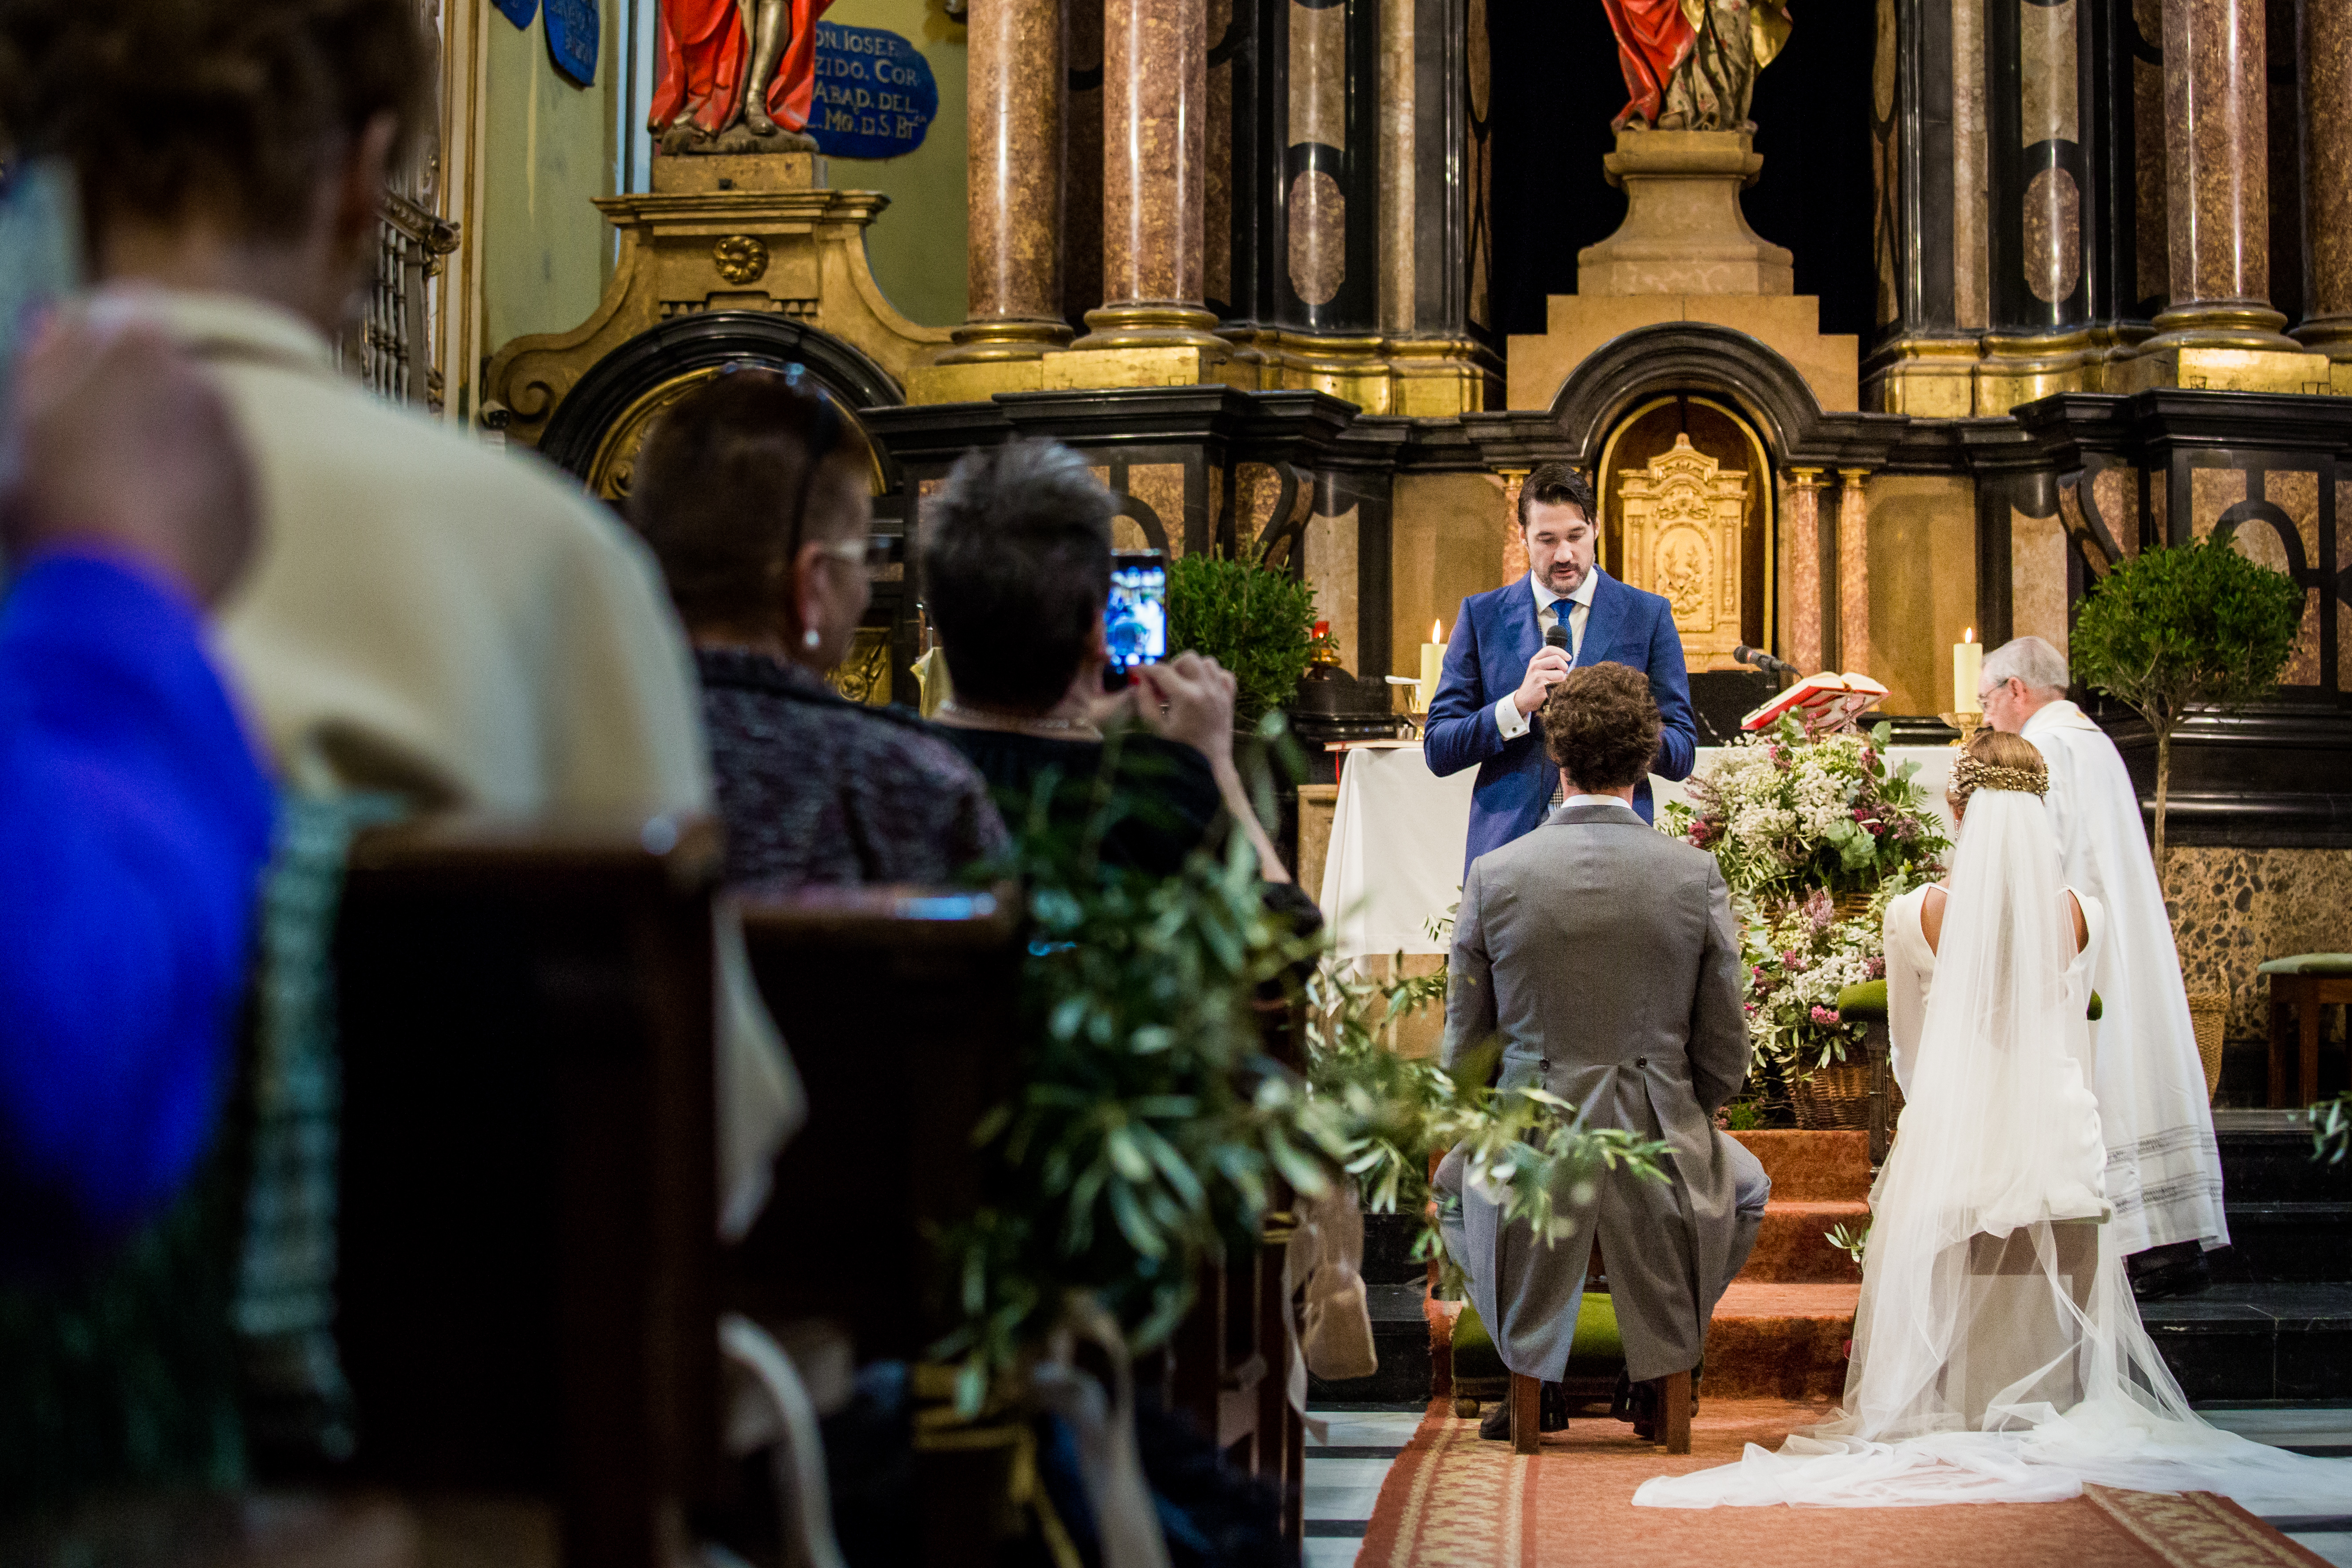 mandarina weddig, fotografos de boda, fotografo boda soria, fotografo boda barcelona, fotografo boda Madrid, fotografo boda lerida, fotografo boda Huesca_20